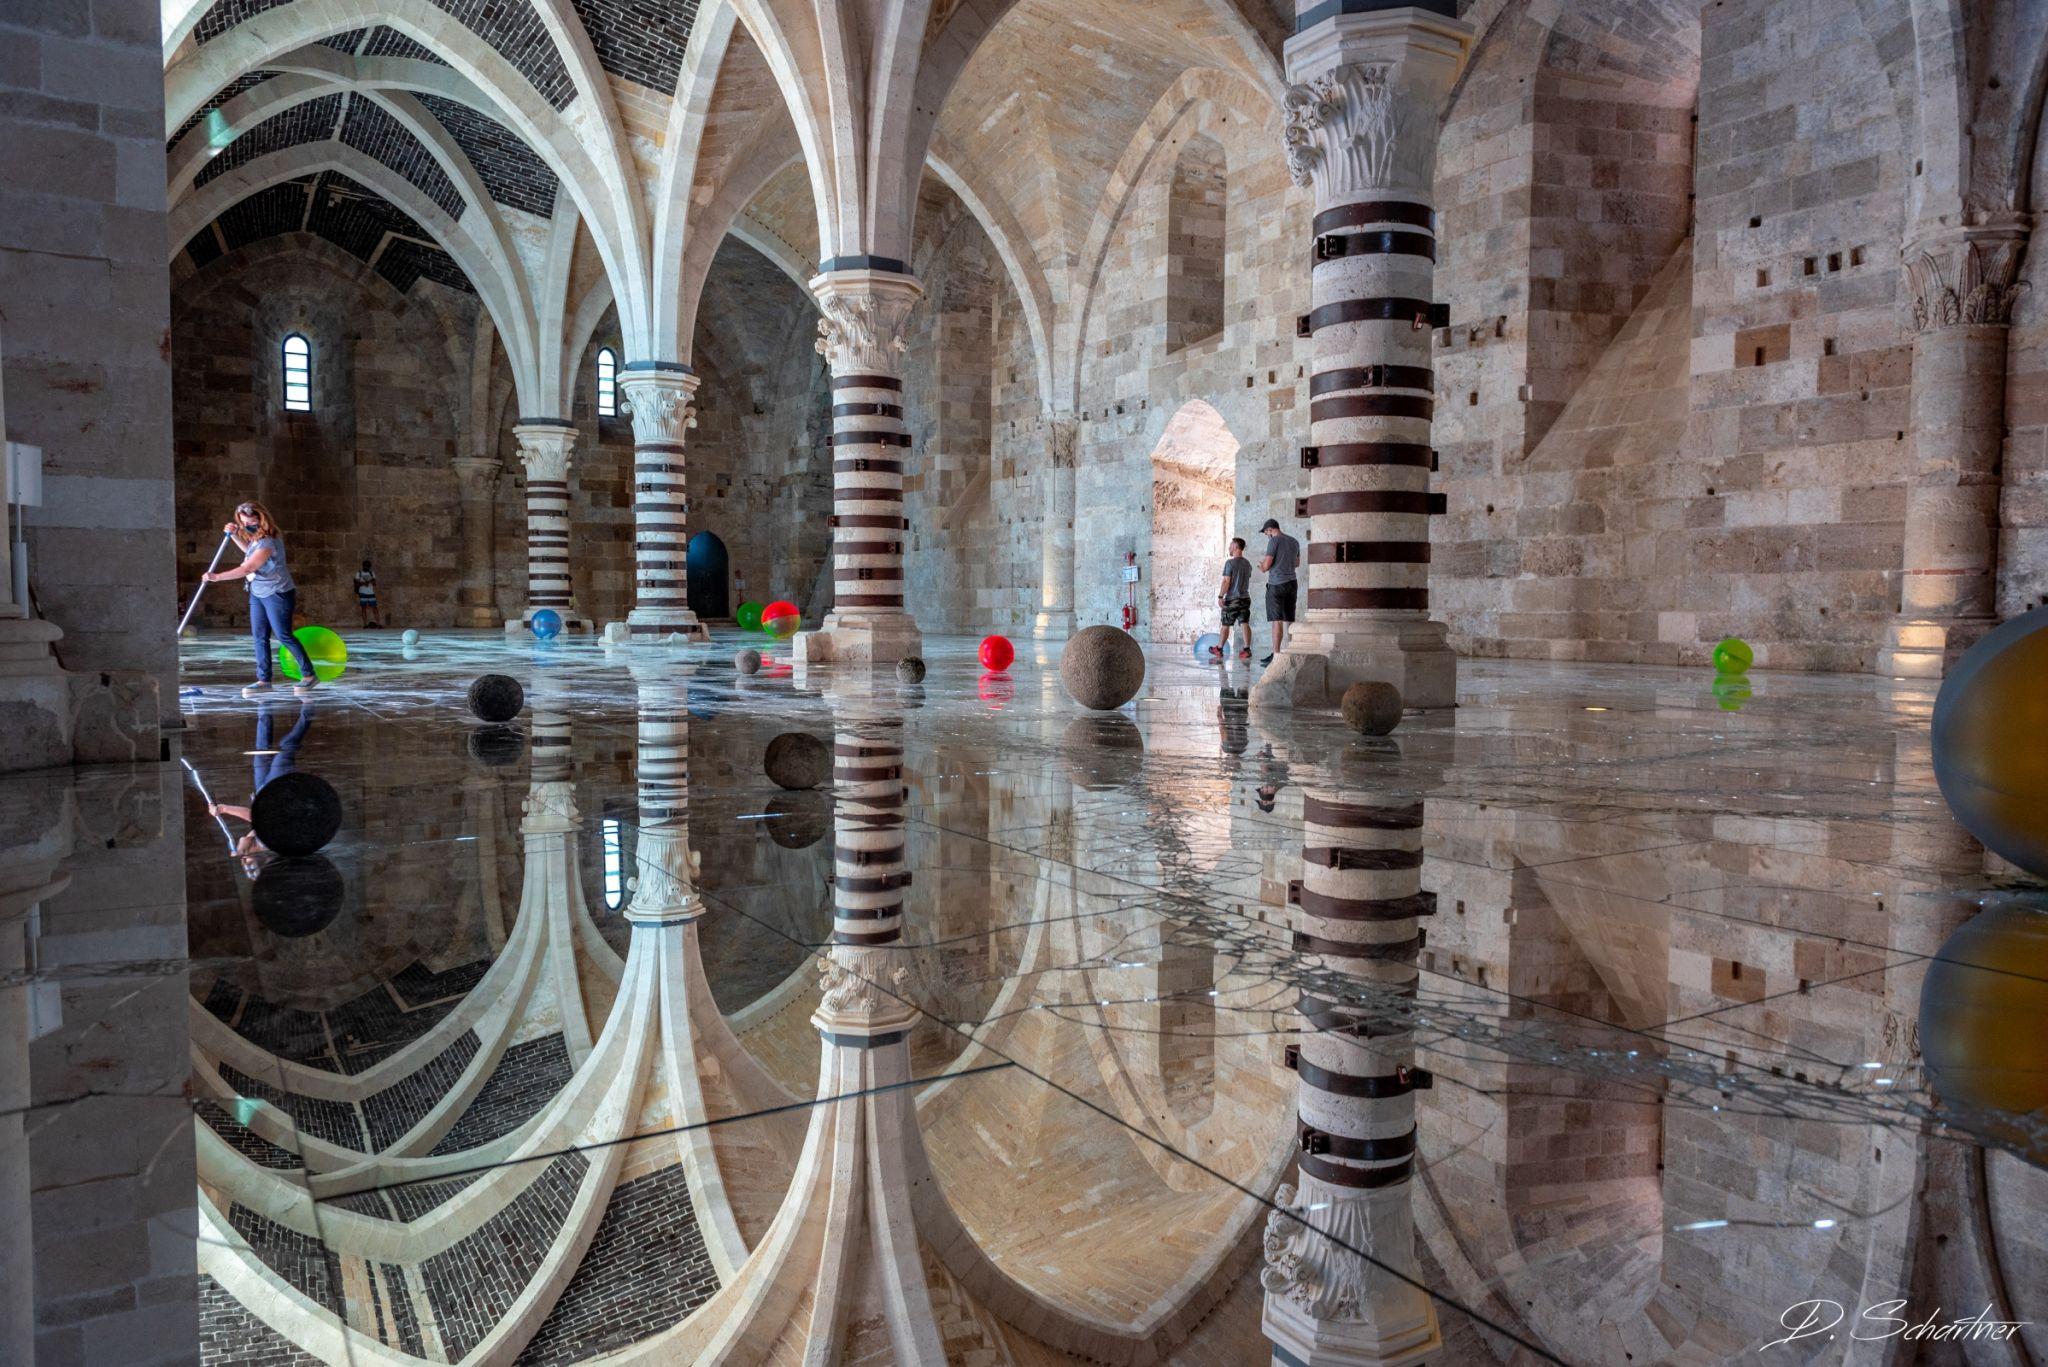 Castello Maniace inside, Italy